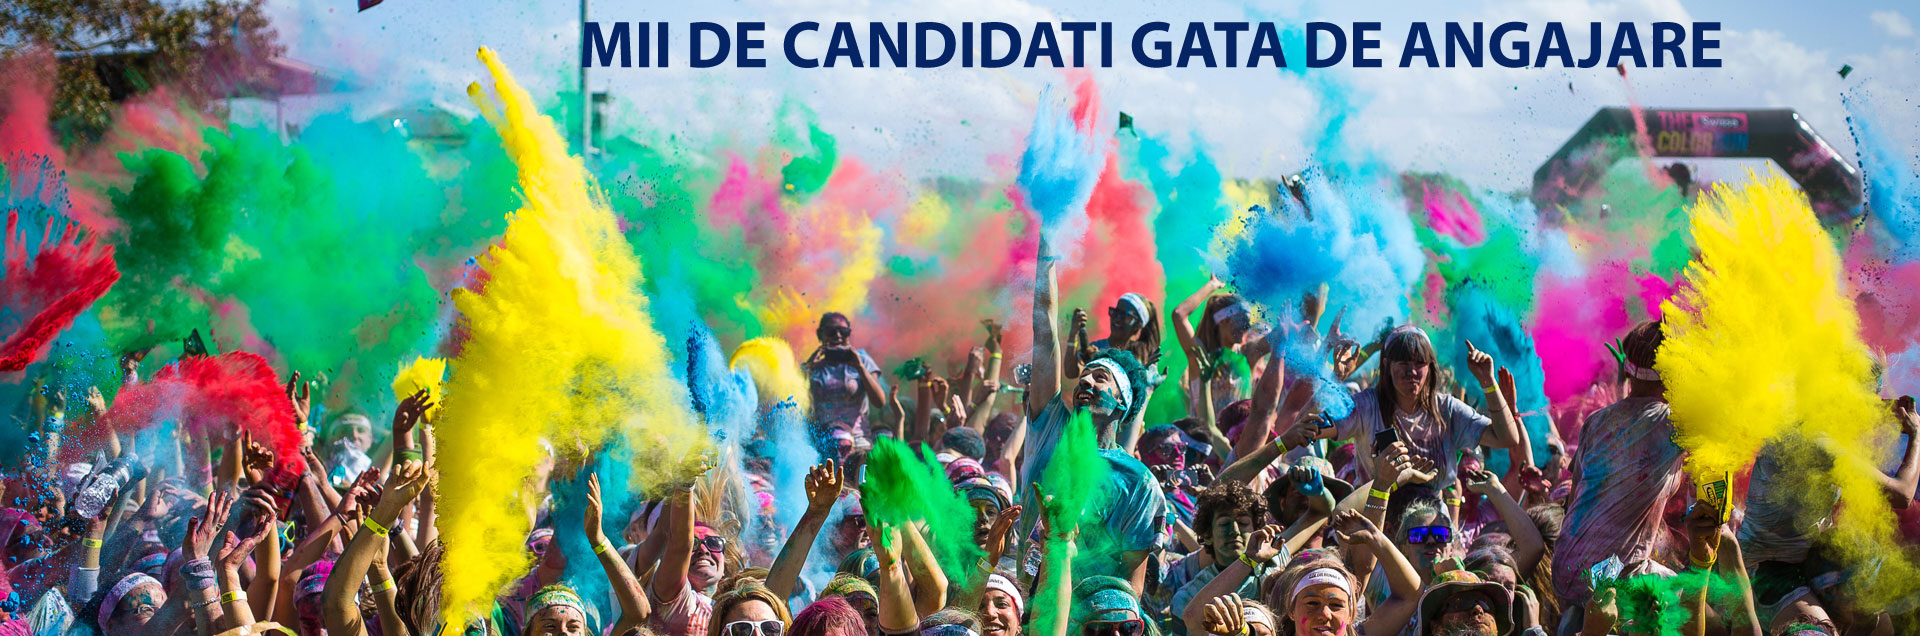 Mii de candidati gata de angajare